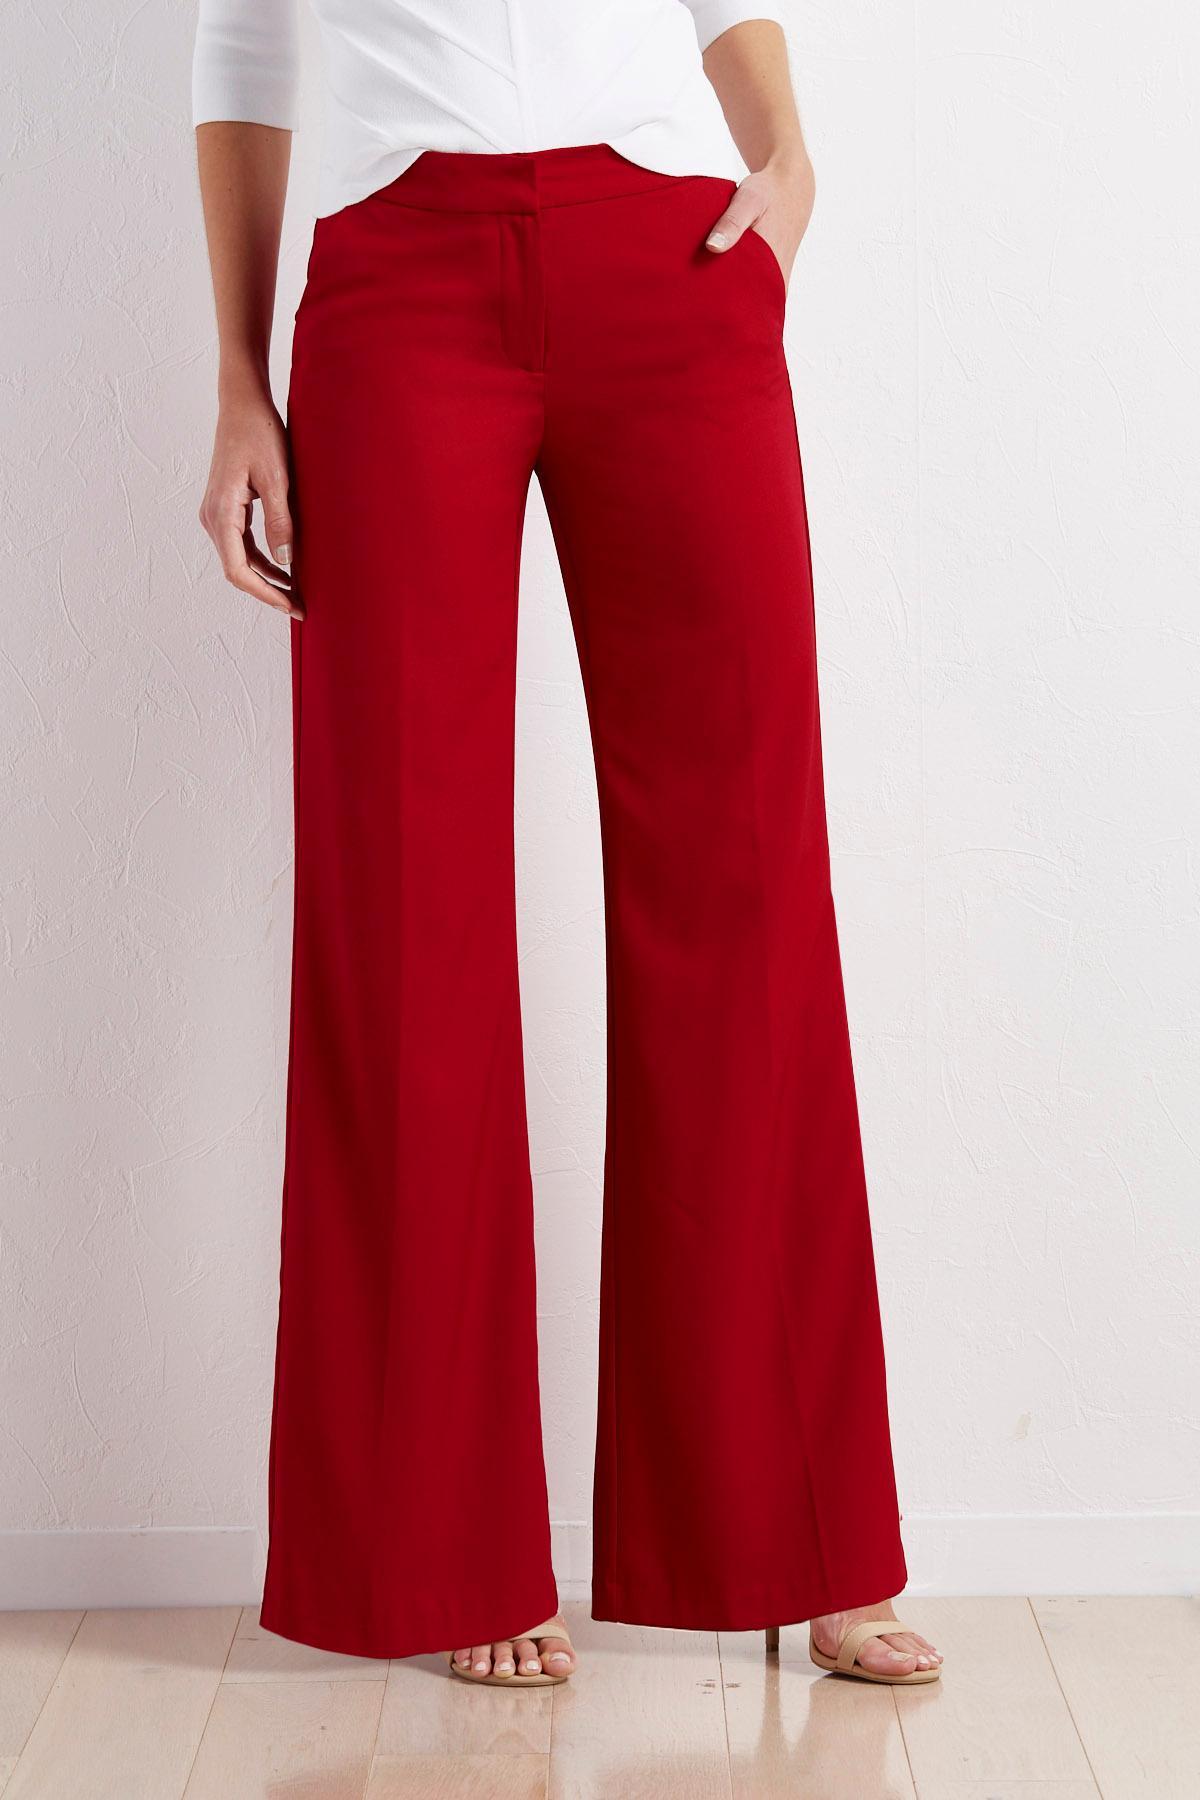 Tailored Wide Leg Pants